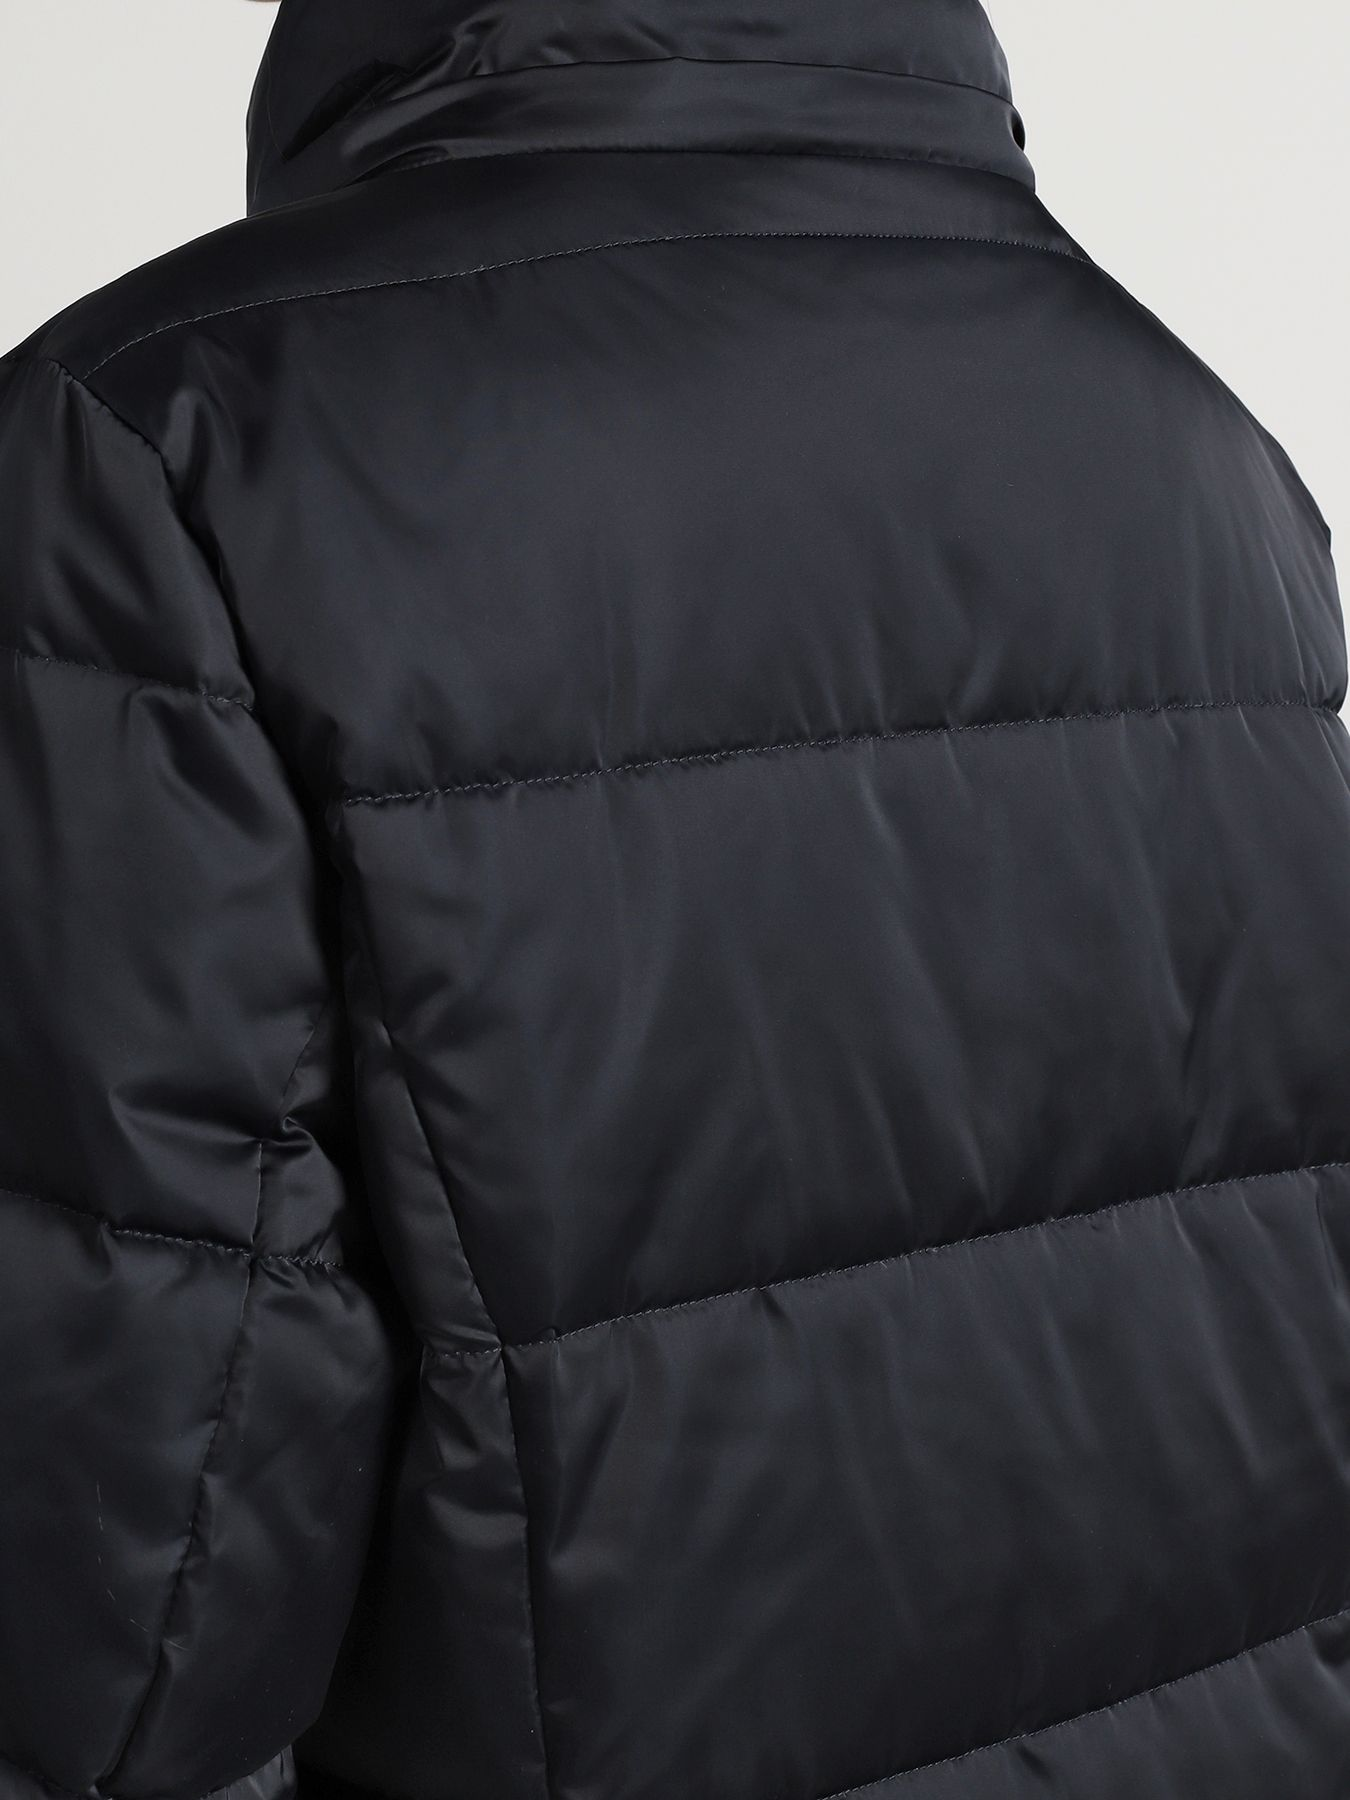 Persona by Marina Rinaldi Удлиненная куртка plus size 353773-056 Фото 5